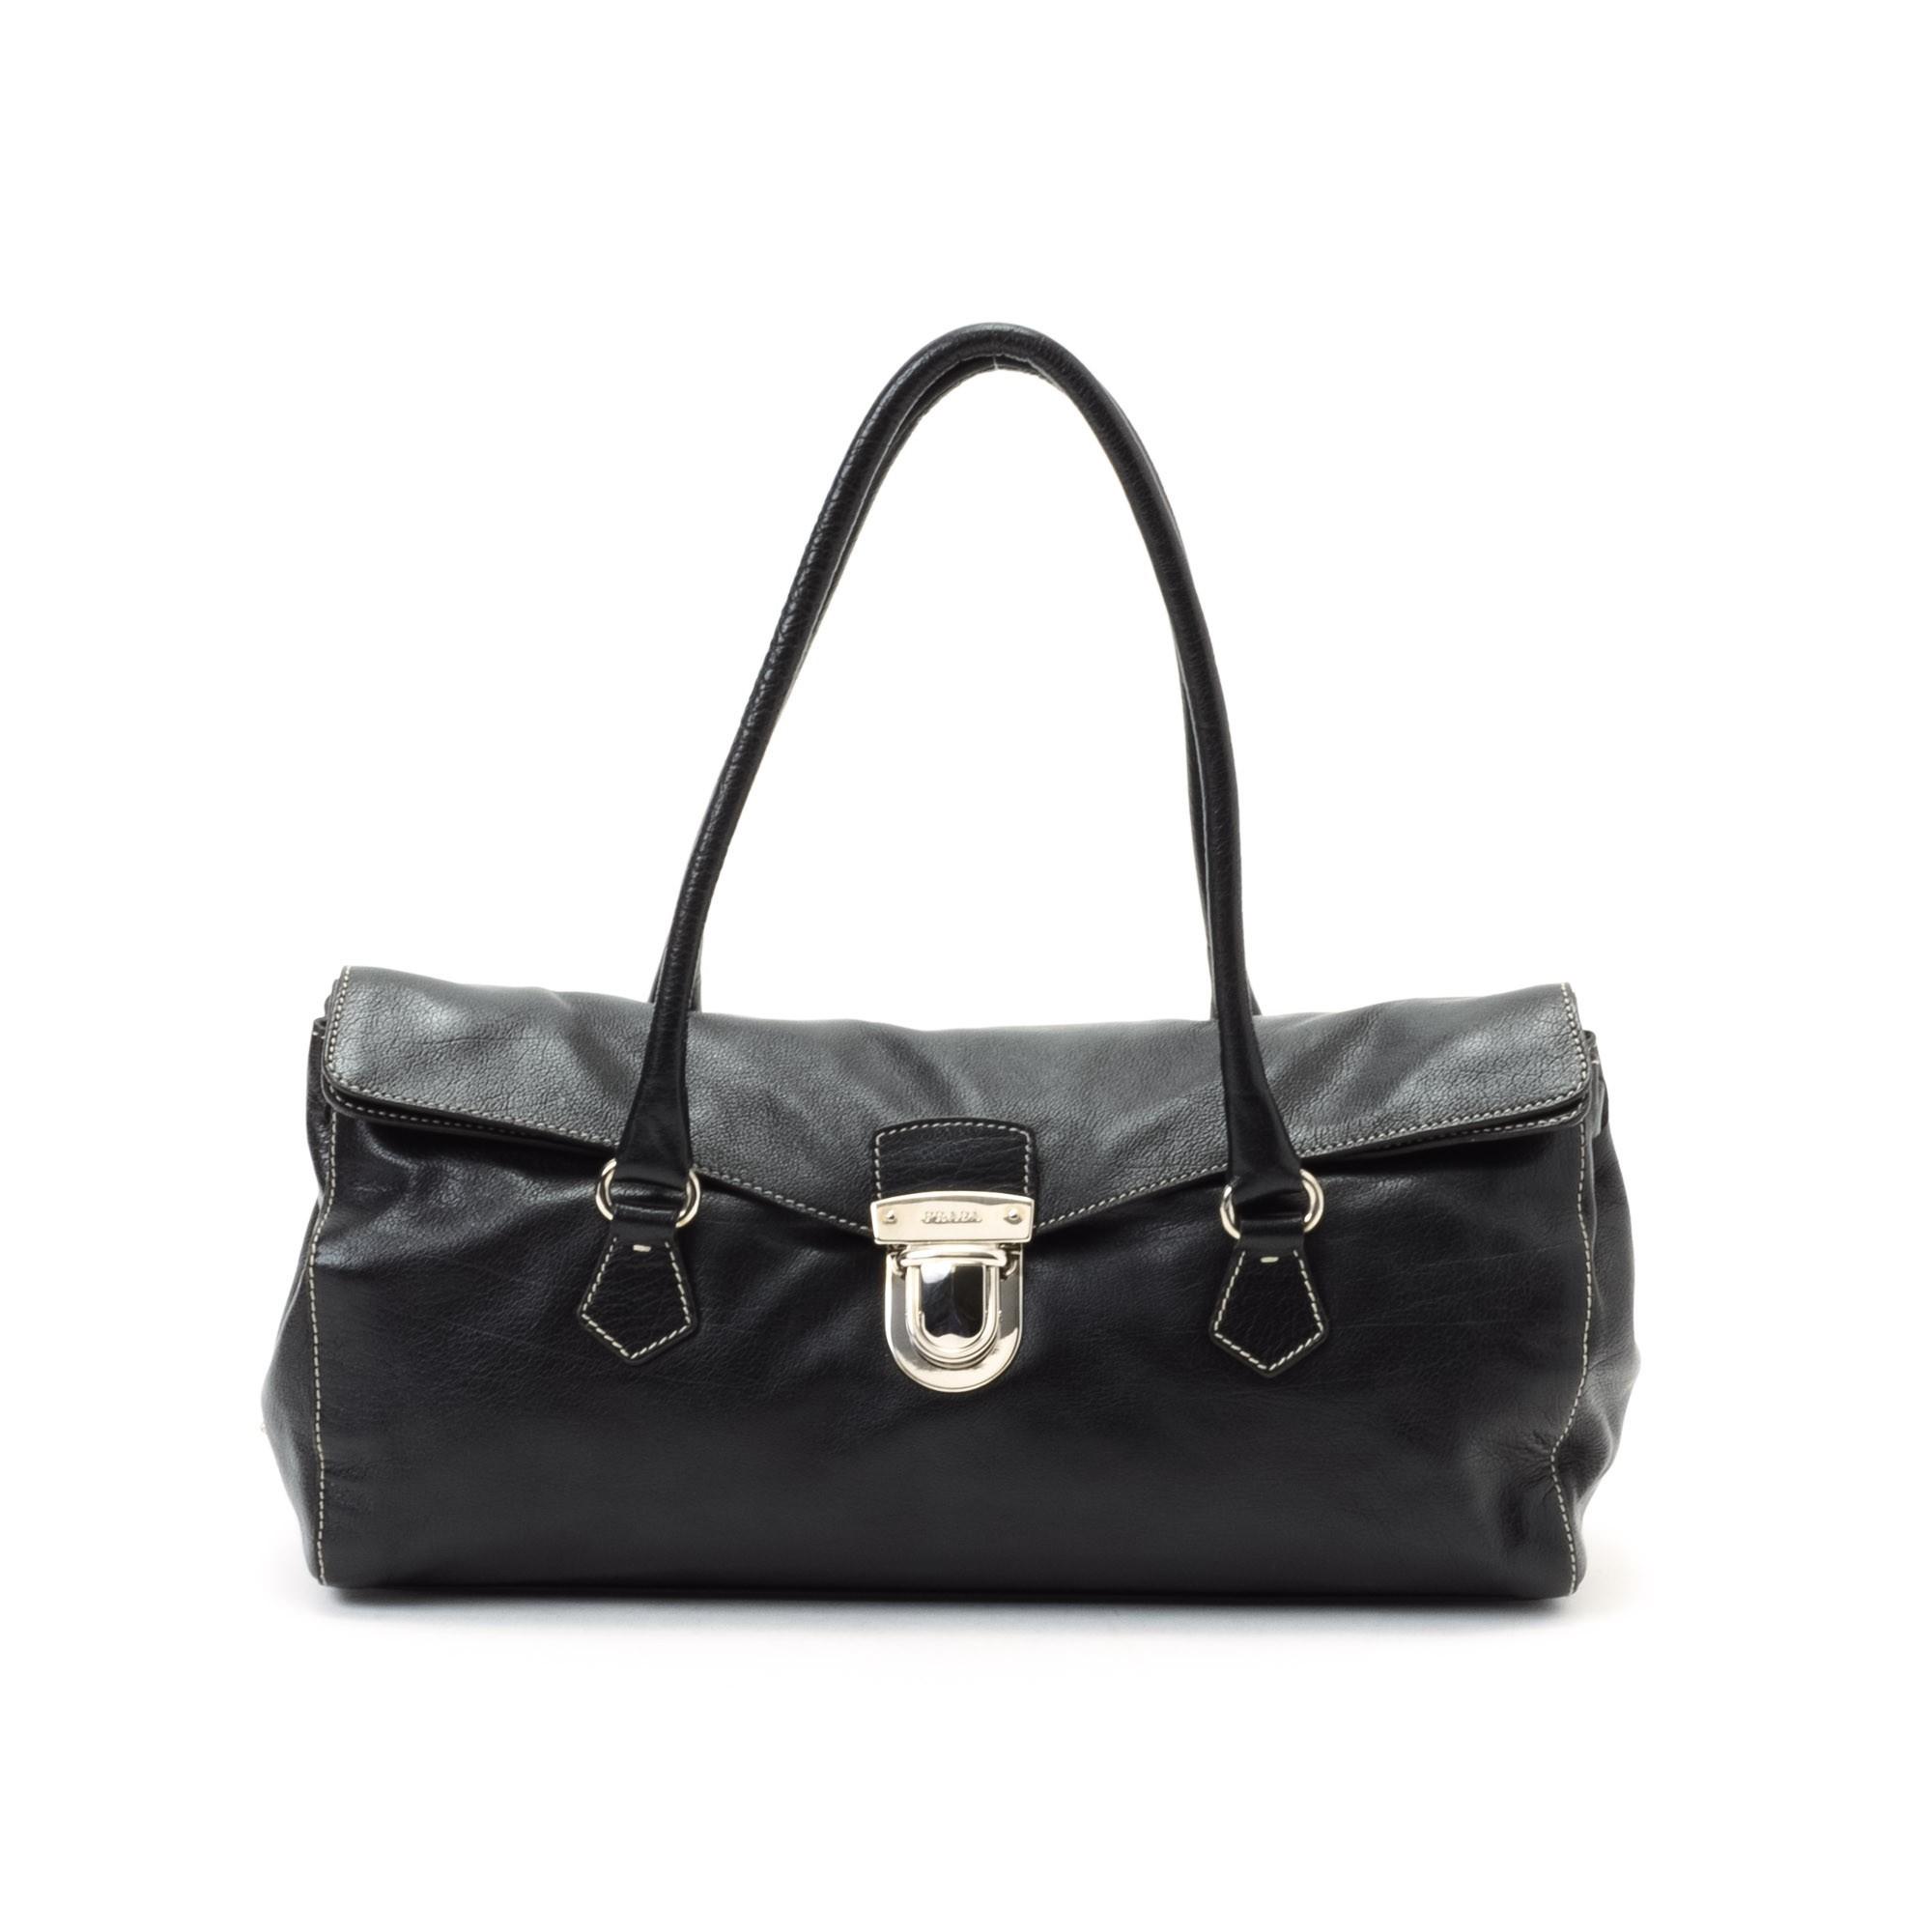 prada white handbag leather